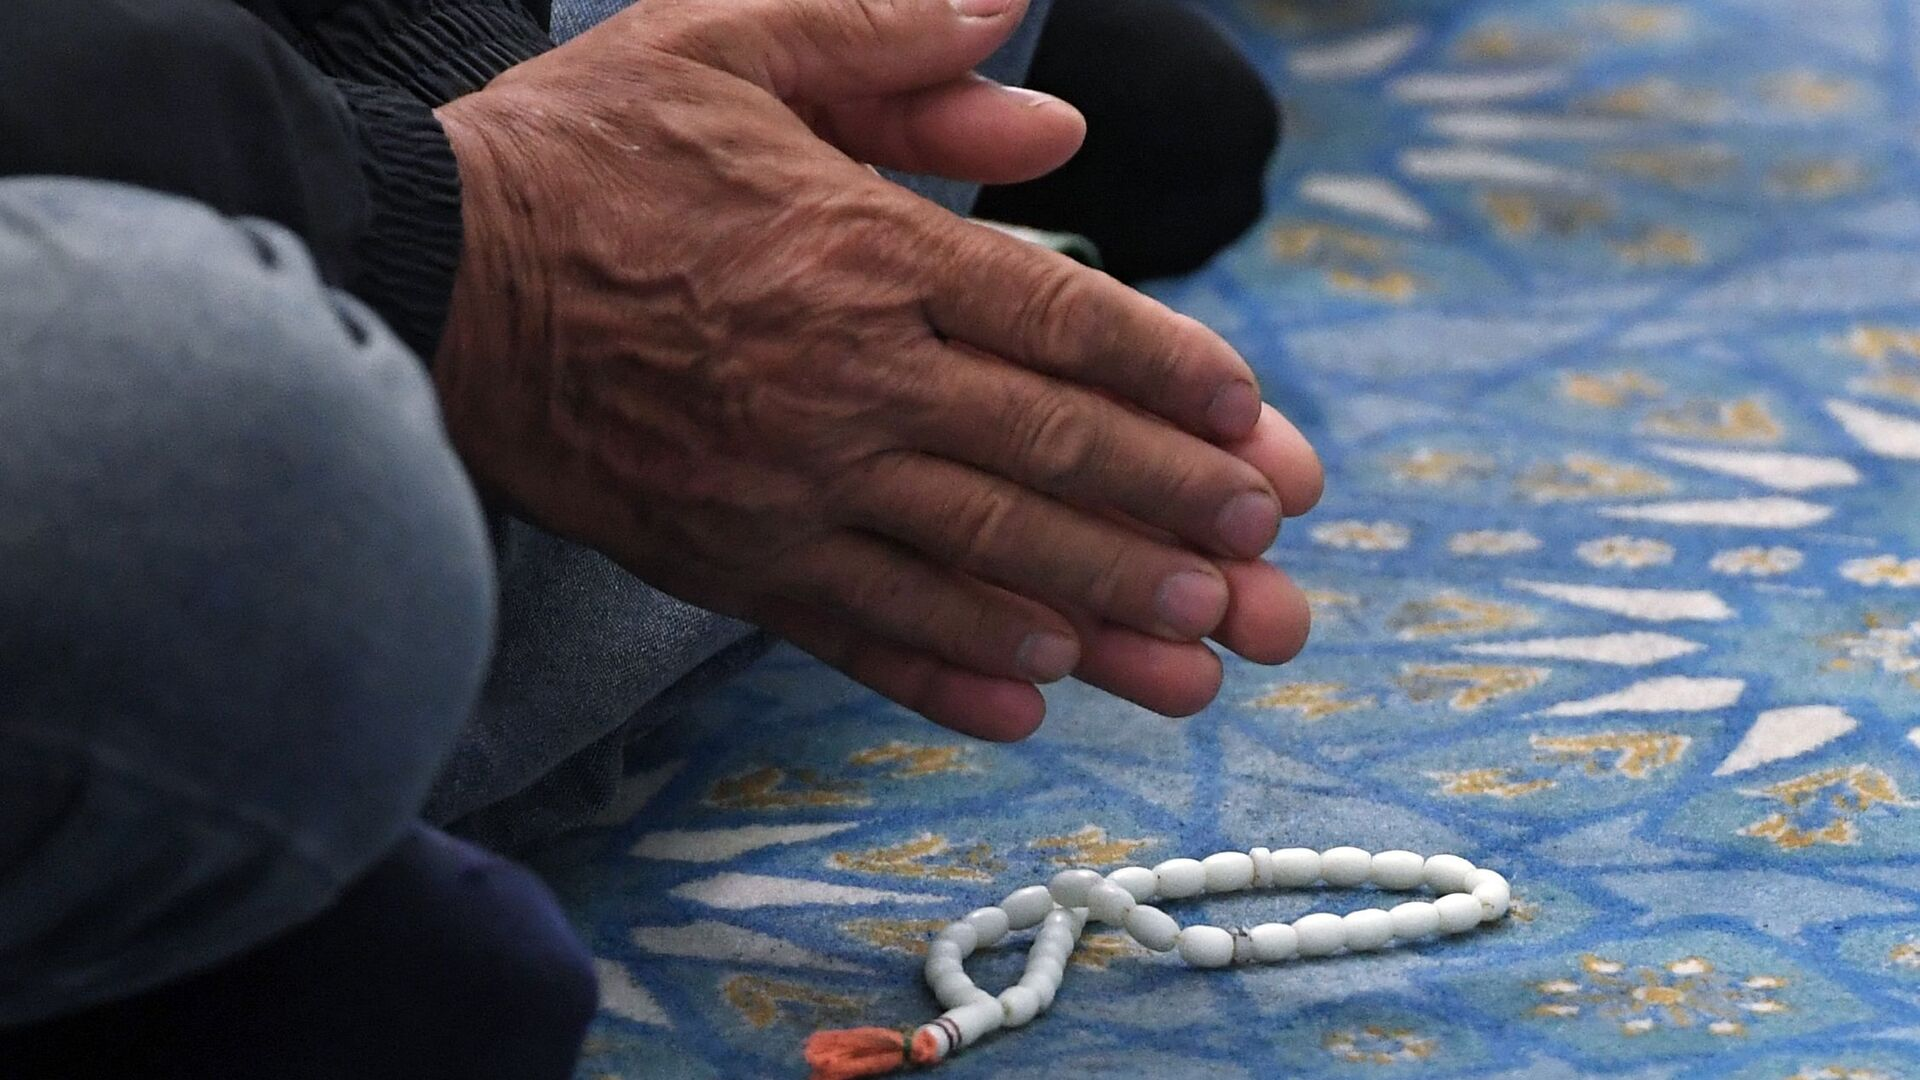 Верующий молится, архивное фото - Sputnik Таджикистан, 1920, 14.08.2021